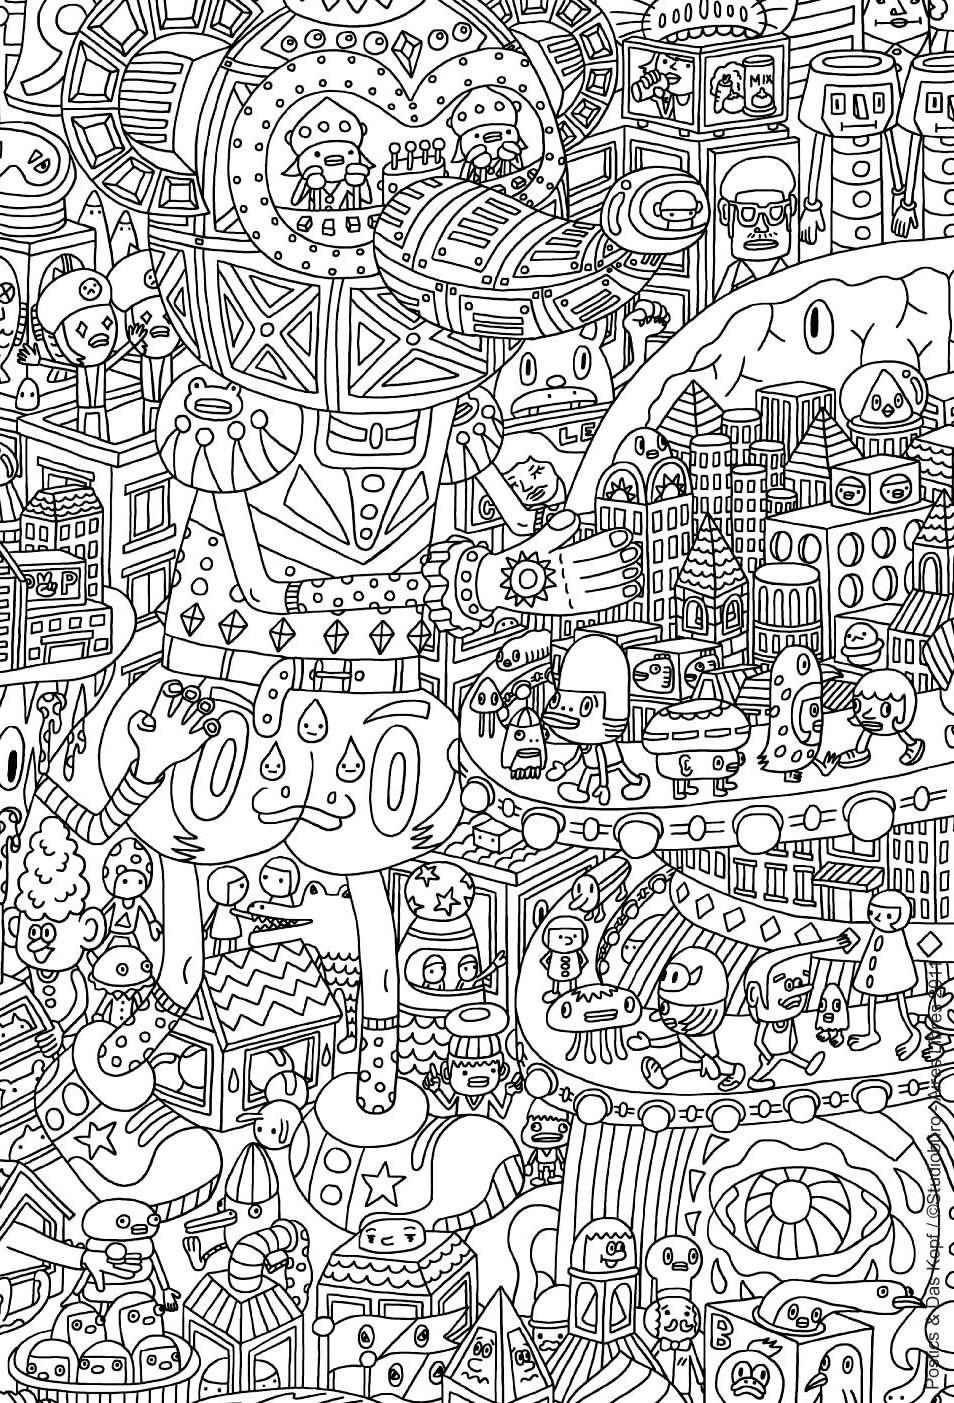 Disegni da colorare per adulti : Doodle art / Doodling - 10